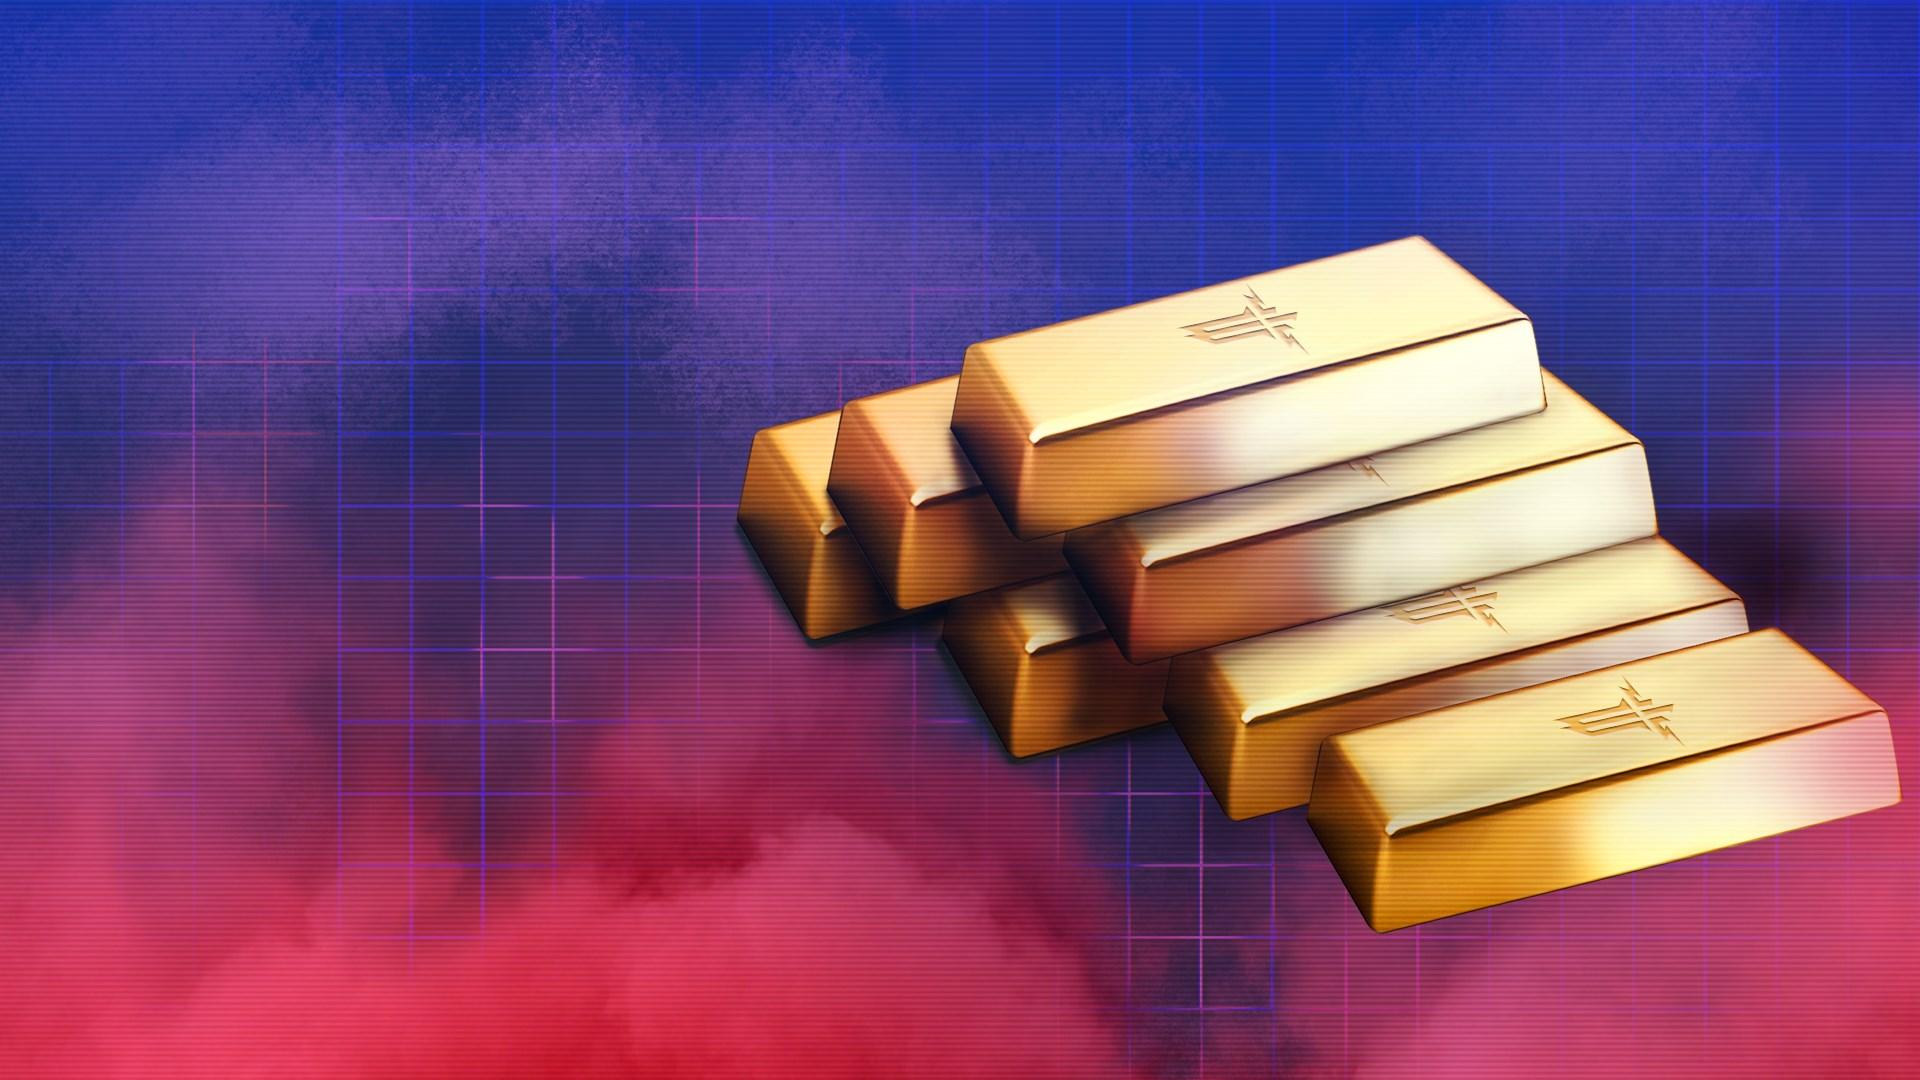 Wolfenstein: Youngblood - 500 Gold Bars